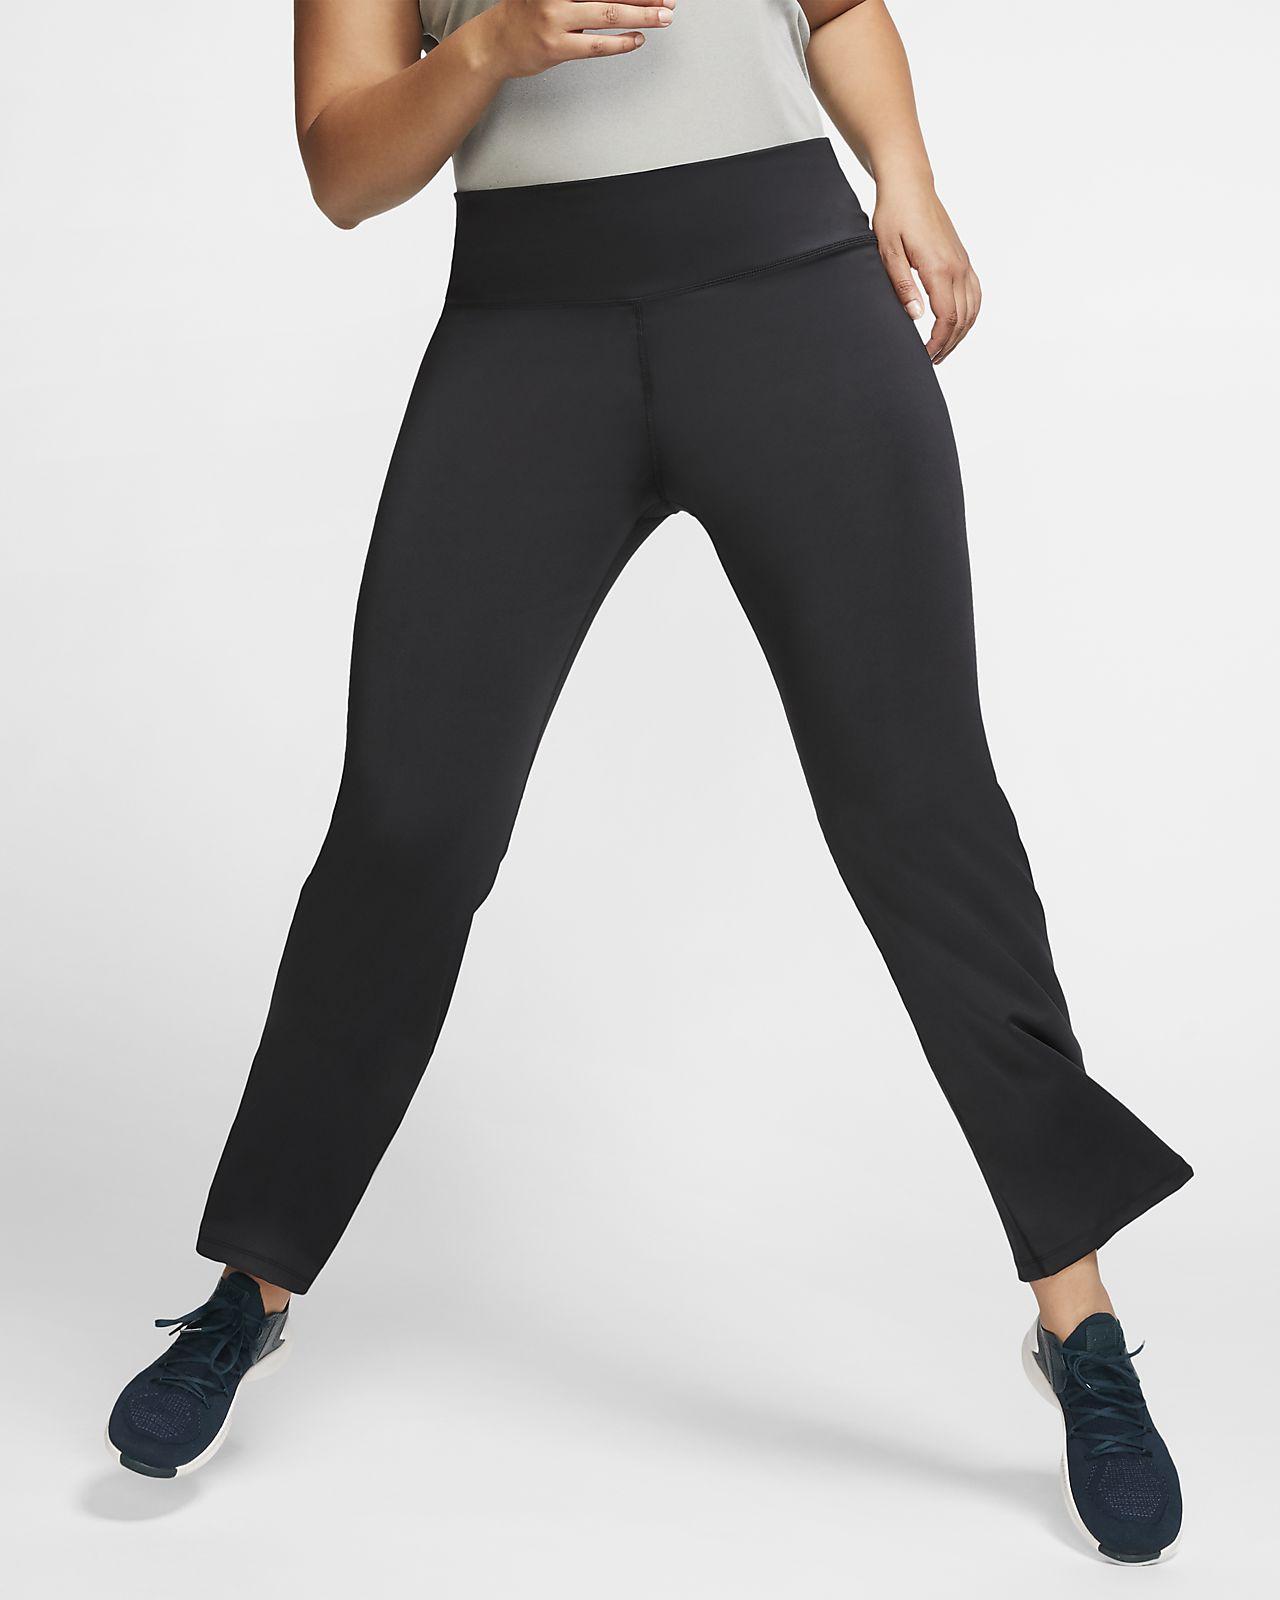 Pantaloni da training Nike Power (Plus Size) - Donna